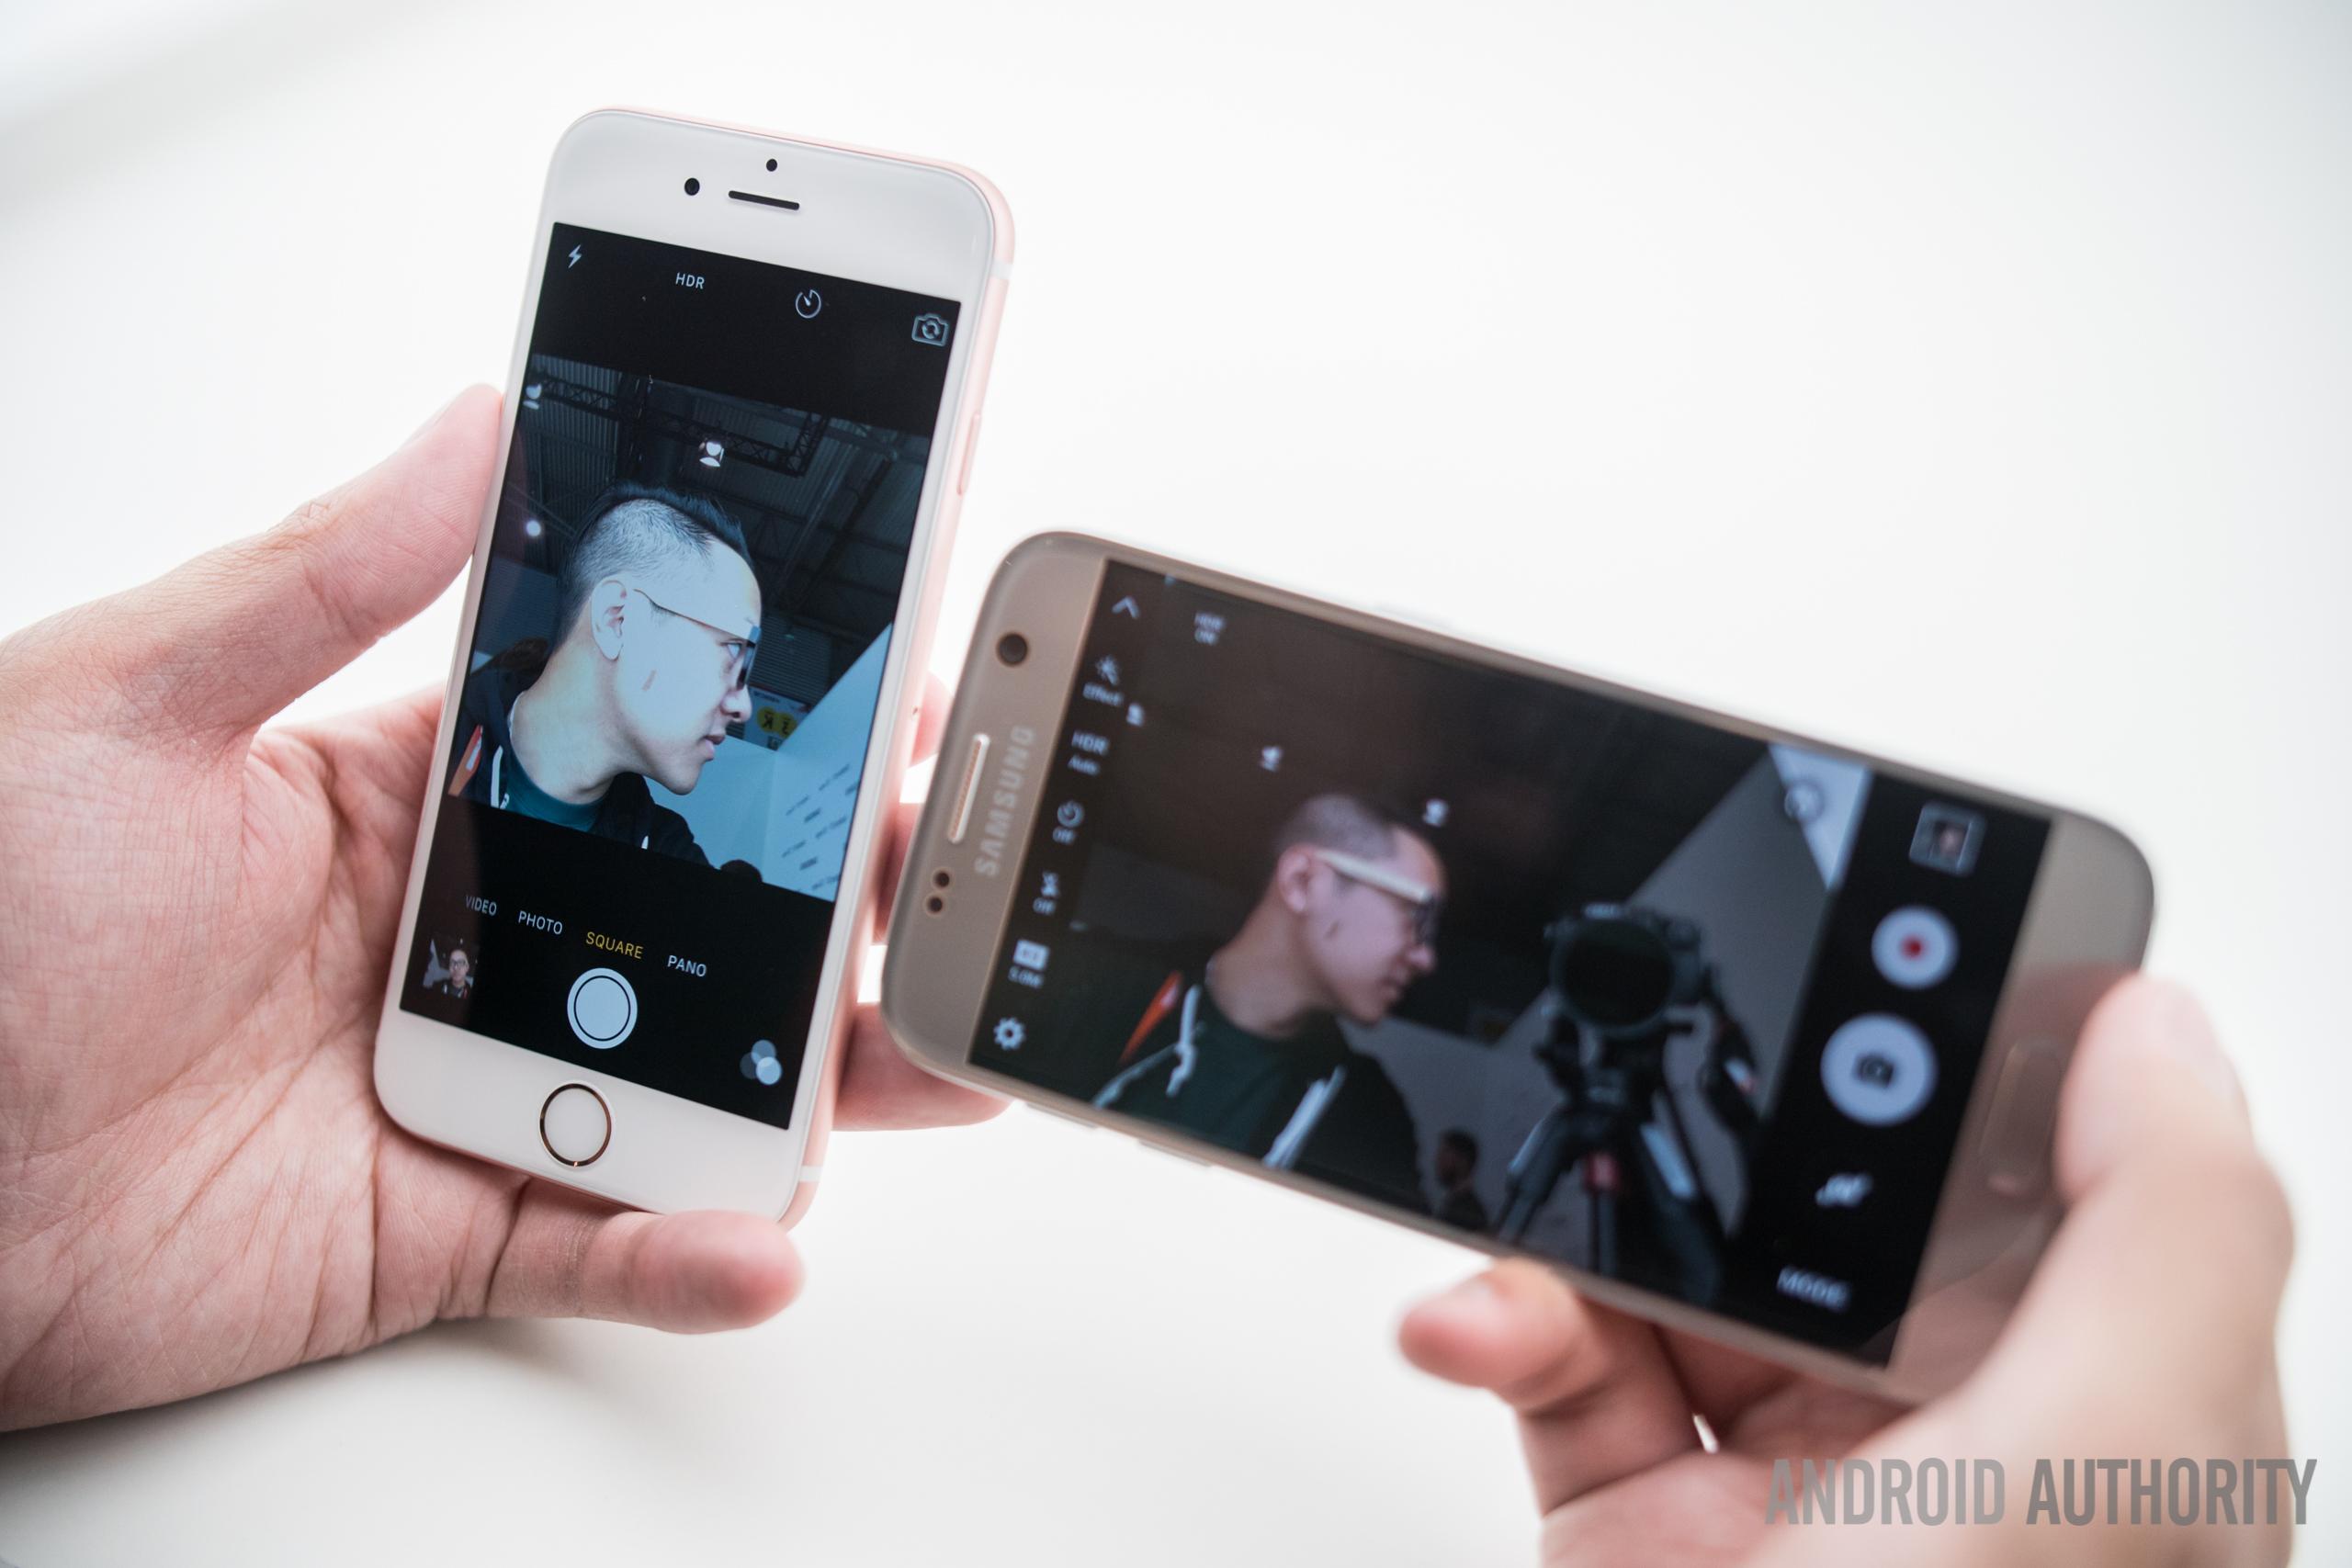 Samsung galaxy s7 vs lg g5 vs apple iphone 6s vs samsung galaxy s6 - Samsung Galaxy S7 Vs Lg G5 Vs Apple Iphone 6s Vs Samsung Galaxy S6 15